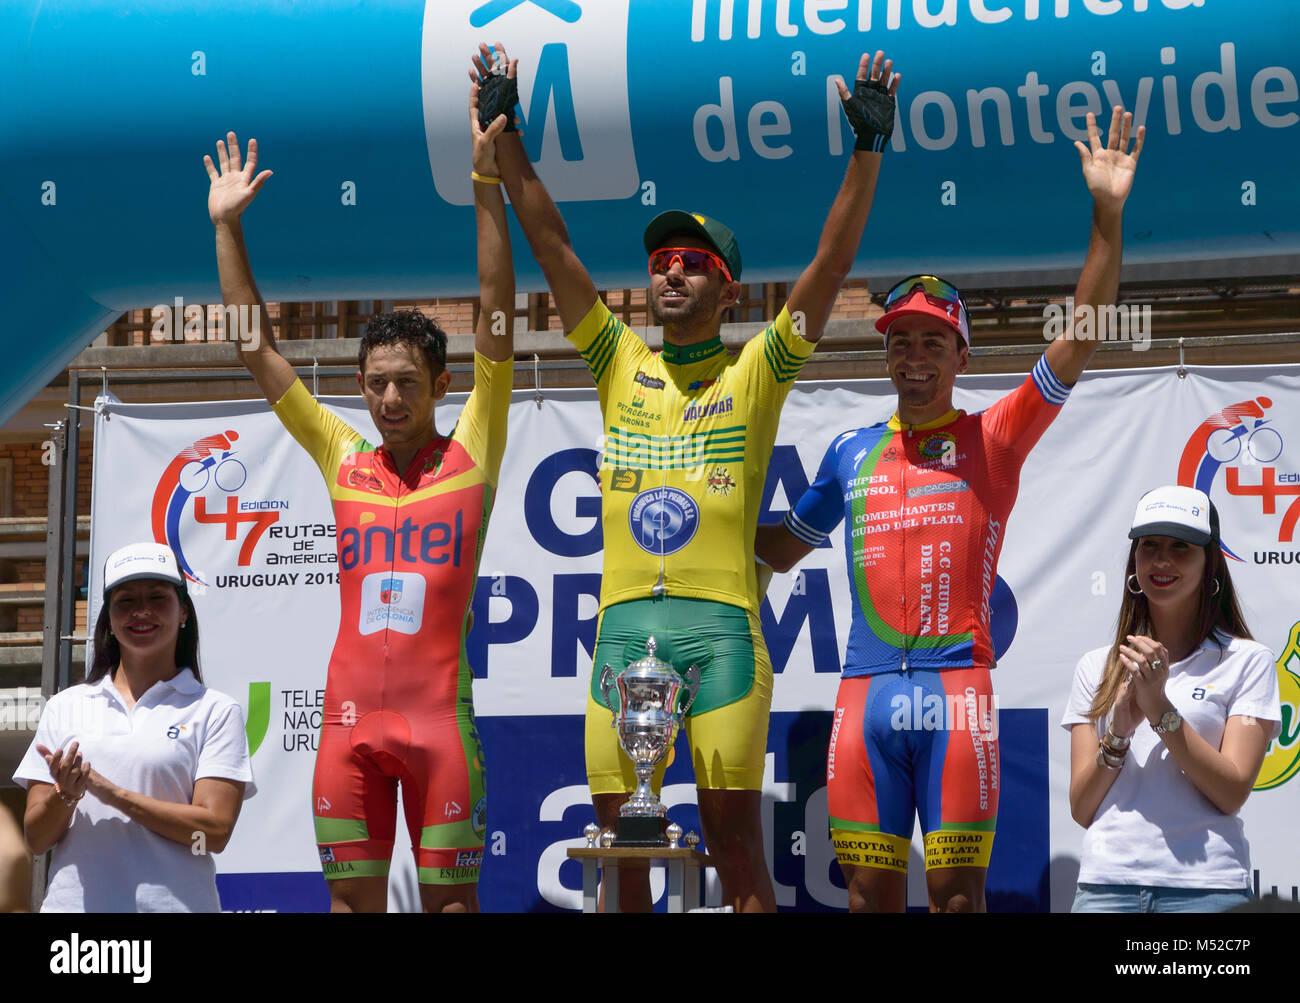 MONTEVIDEO, URUGUAY – FEBRUARY 18, 2018: last stage podium in 47 edition Rutas de America. - Stock Image